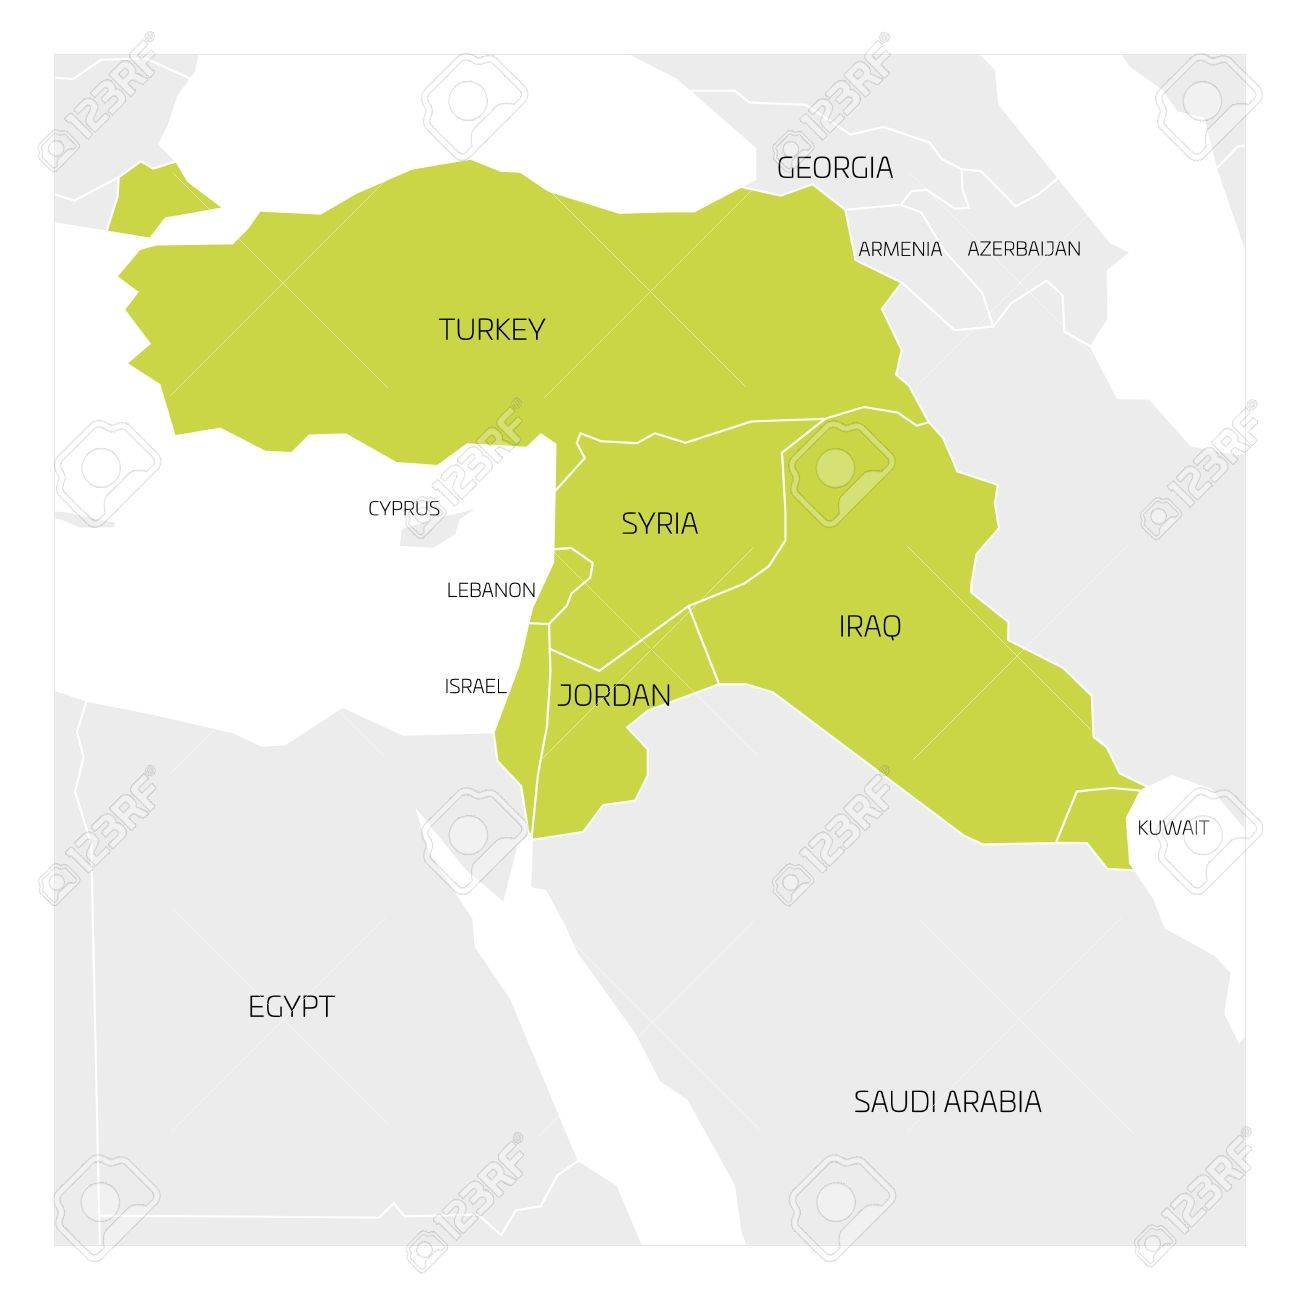 syria map map of syria damascus turkey iraq jordan lebanon